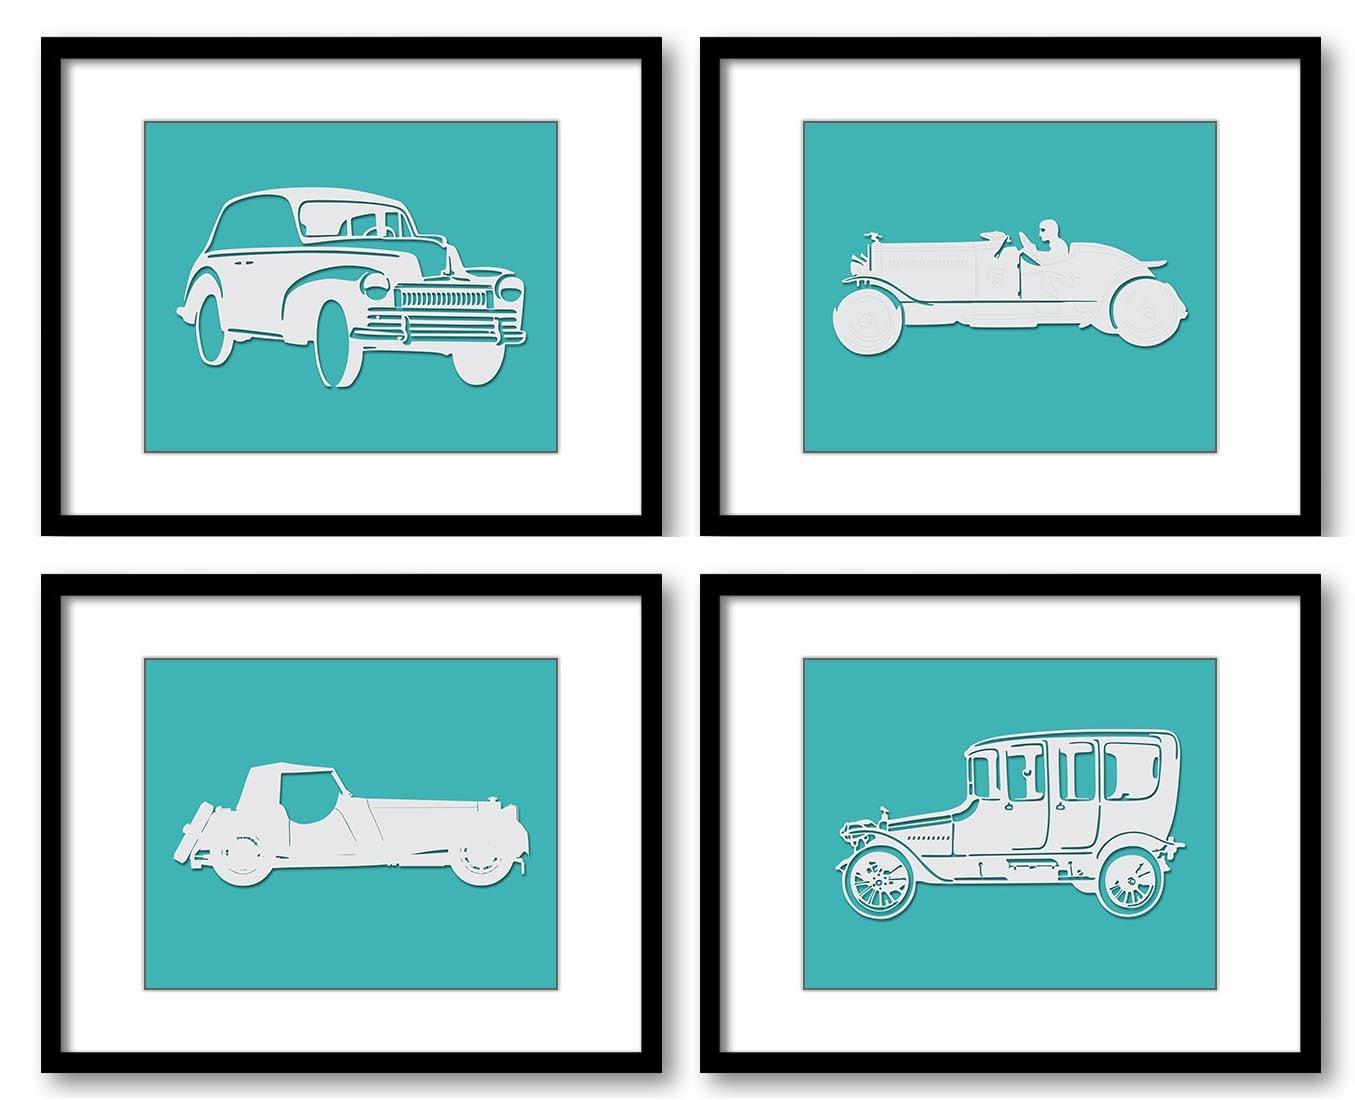 Green Teal Old Cars Classic Antique Vintage Kids Children Art Set of 4 Prints Boys Art Nursery Art N